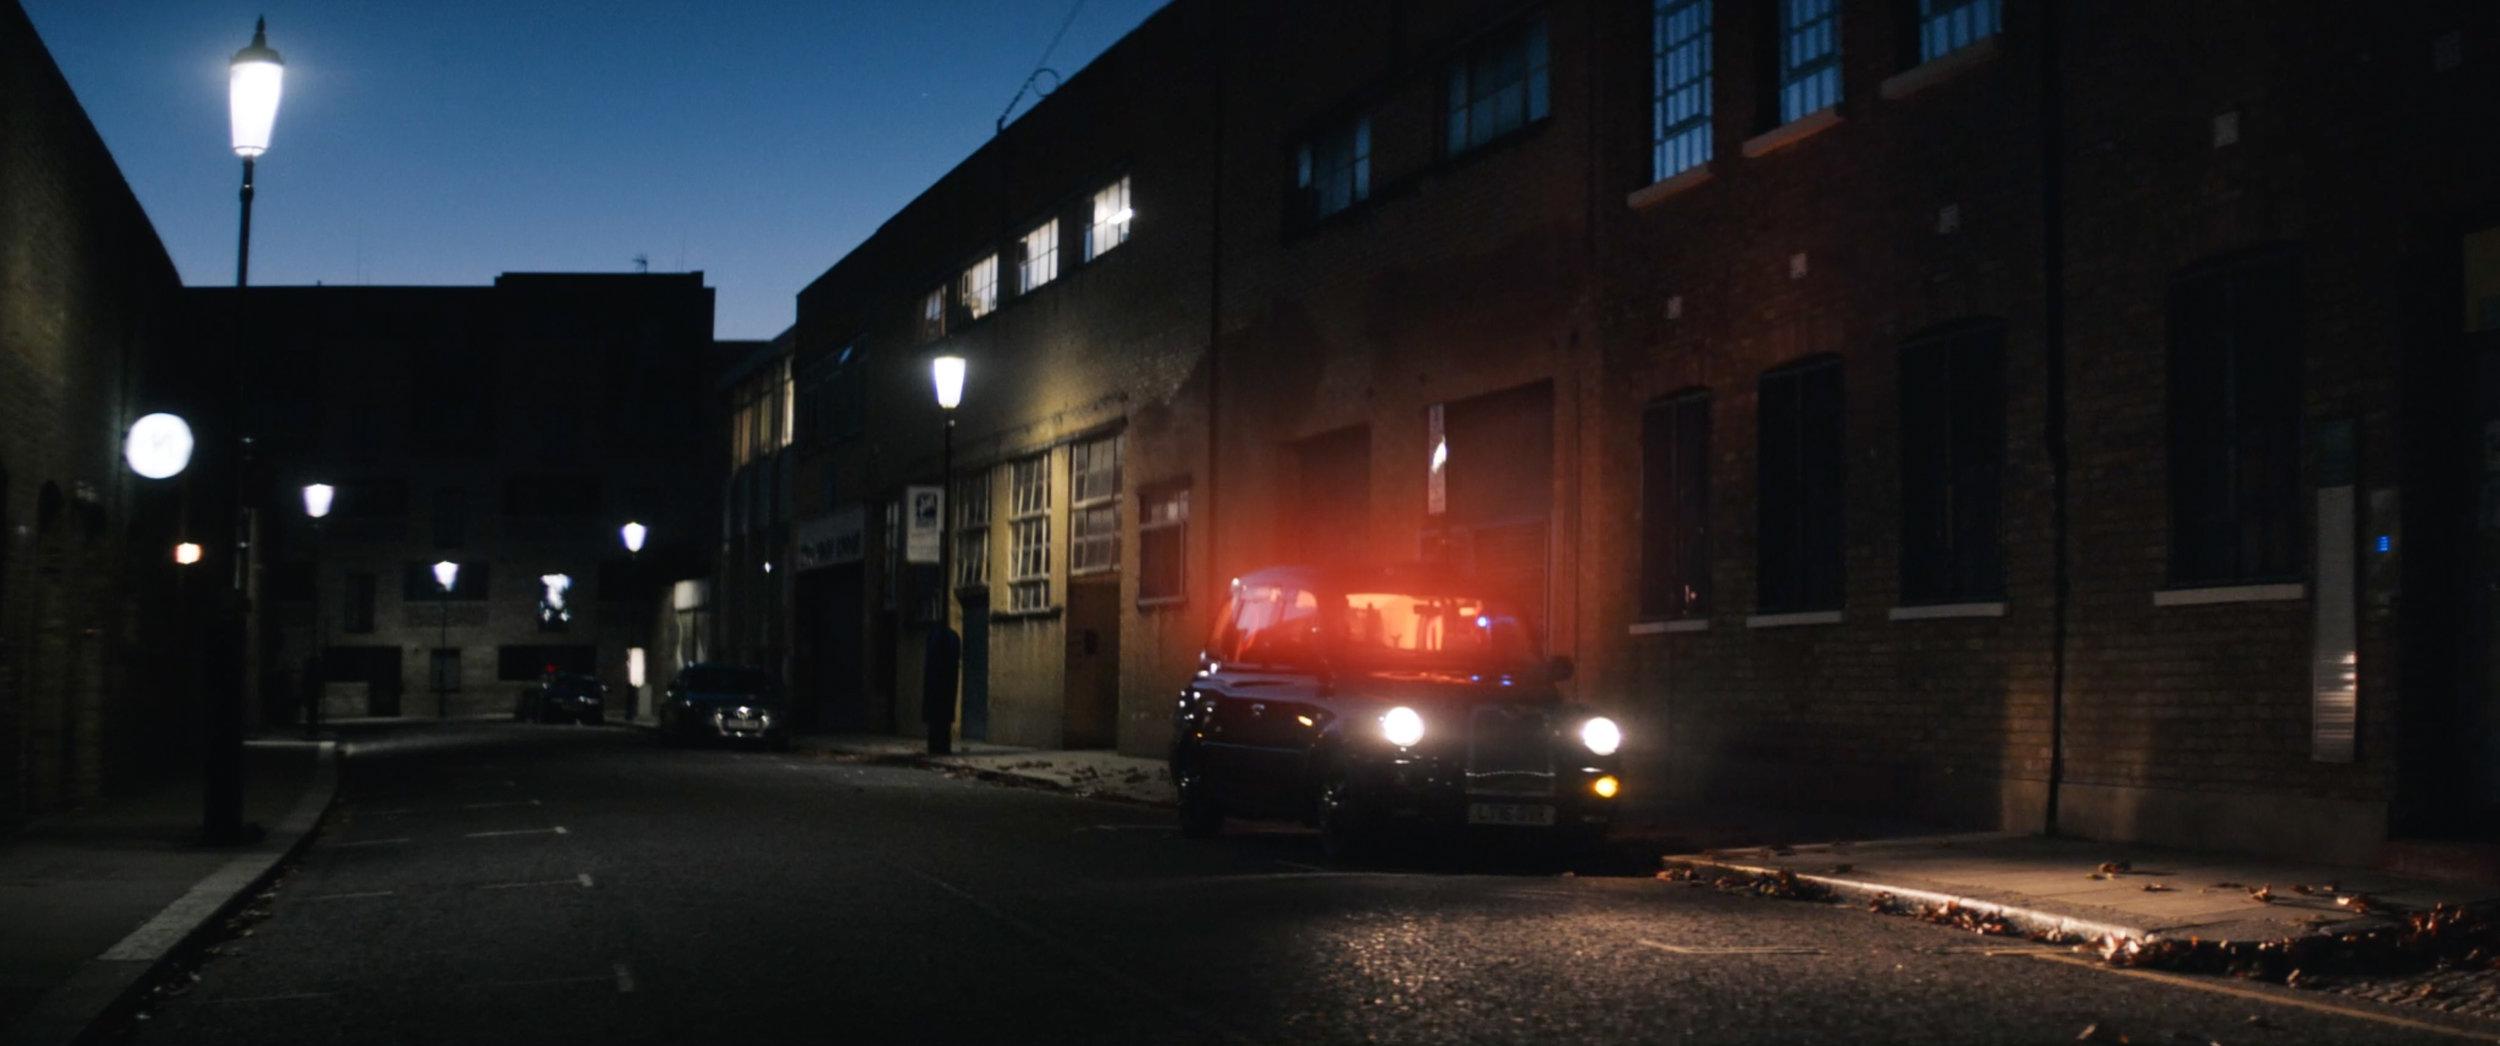 "POPSA ""Glow""  Commercial"